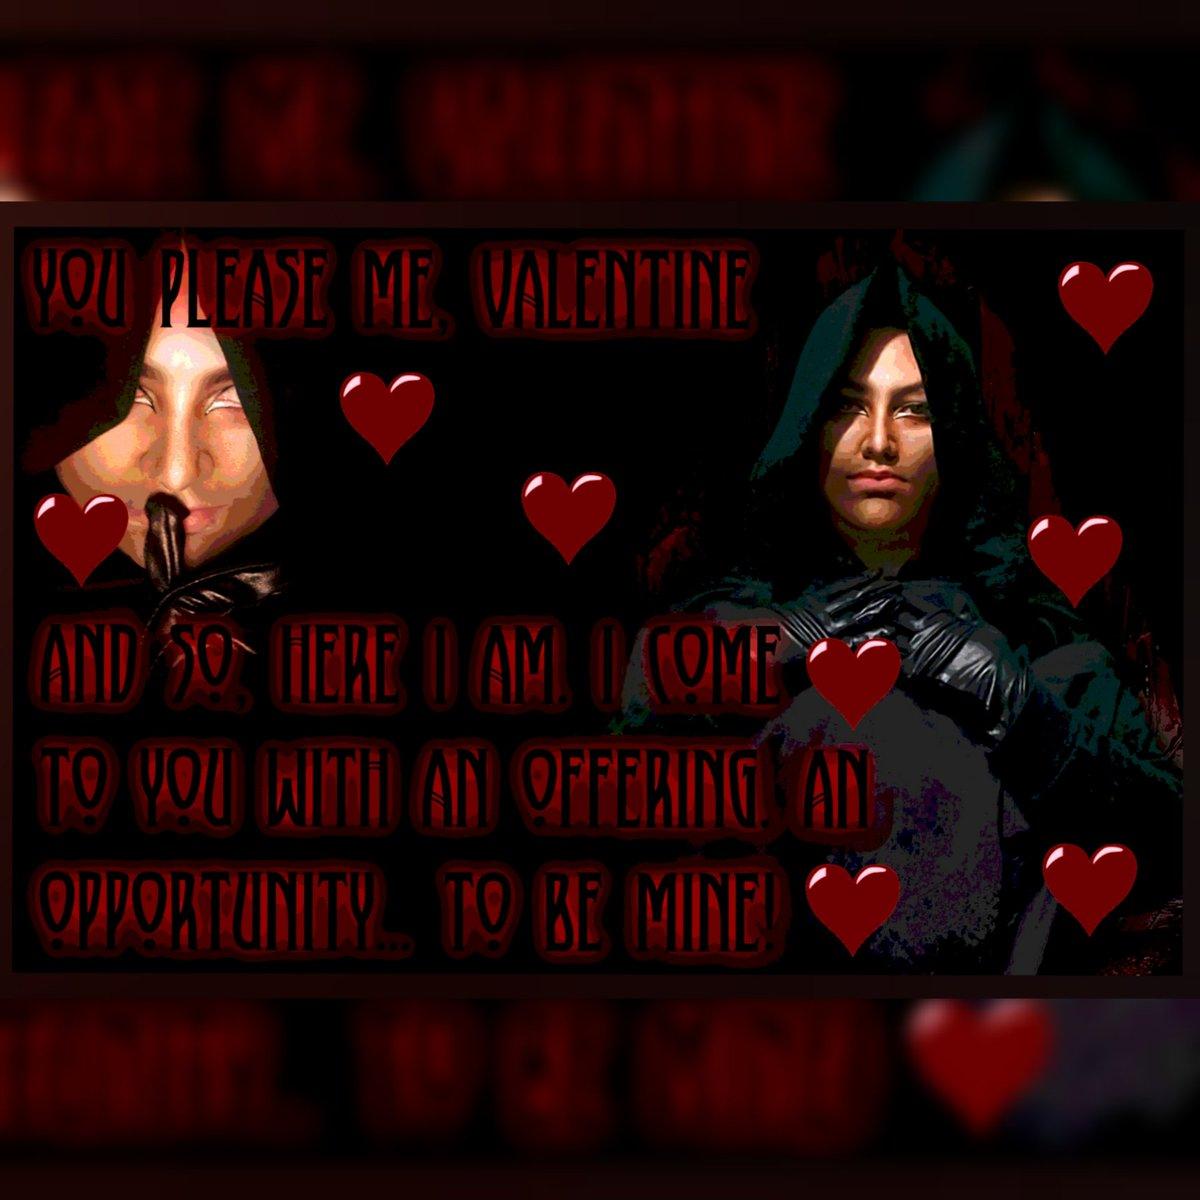 Lucien Lachance wishes you all a great Valentine's Day! . #LucienLachance #TheDarkBrotherhood #theelderscrolls #Oblivionpic.twitter.com/LEYG8DGYFx